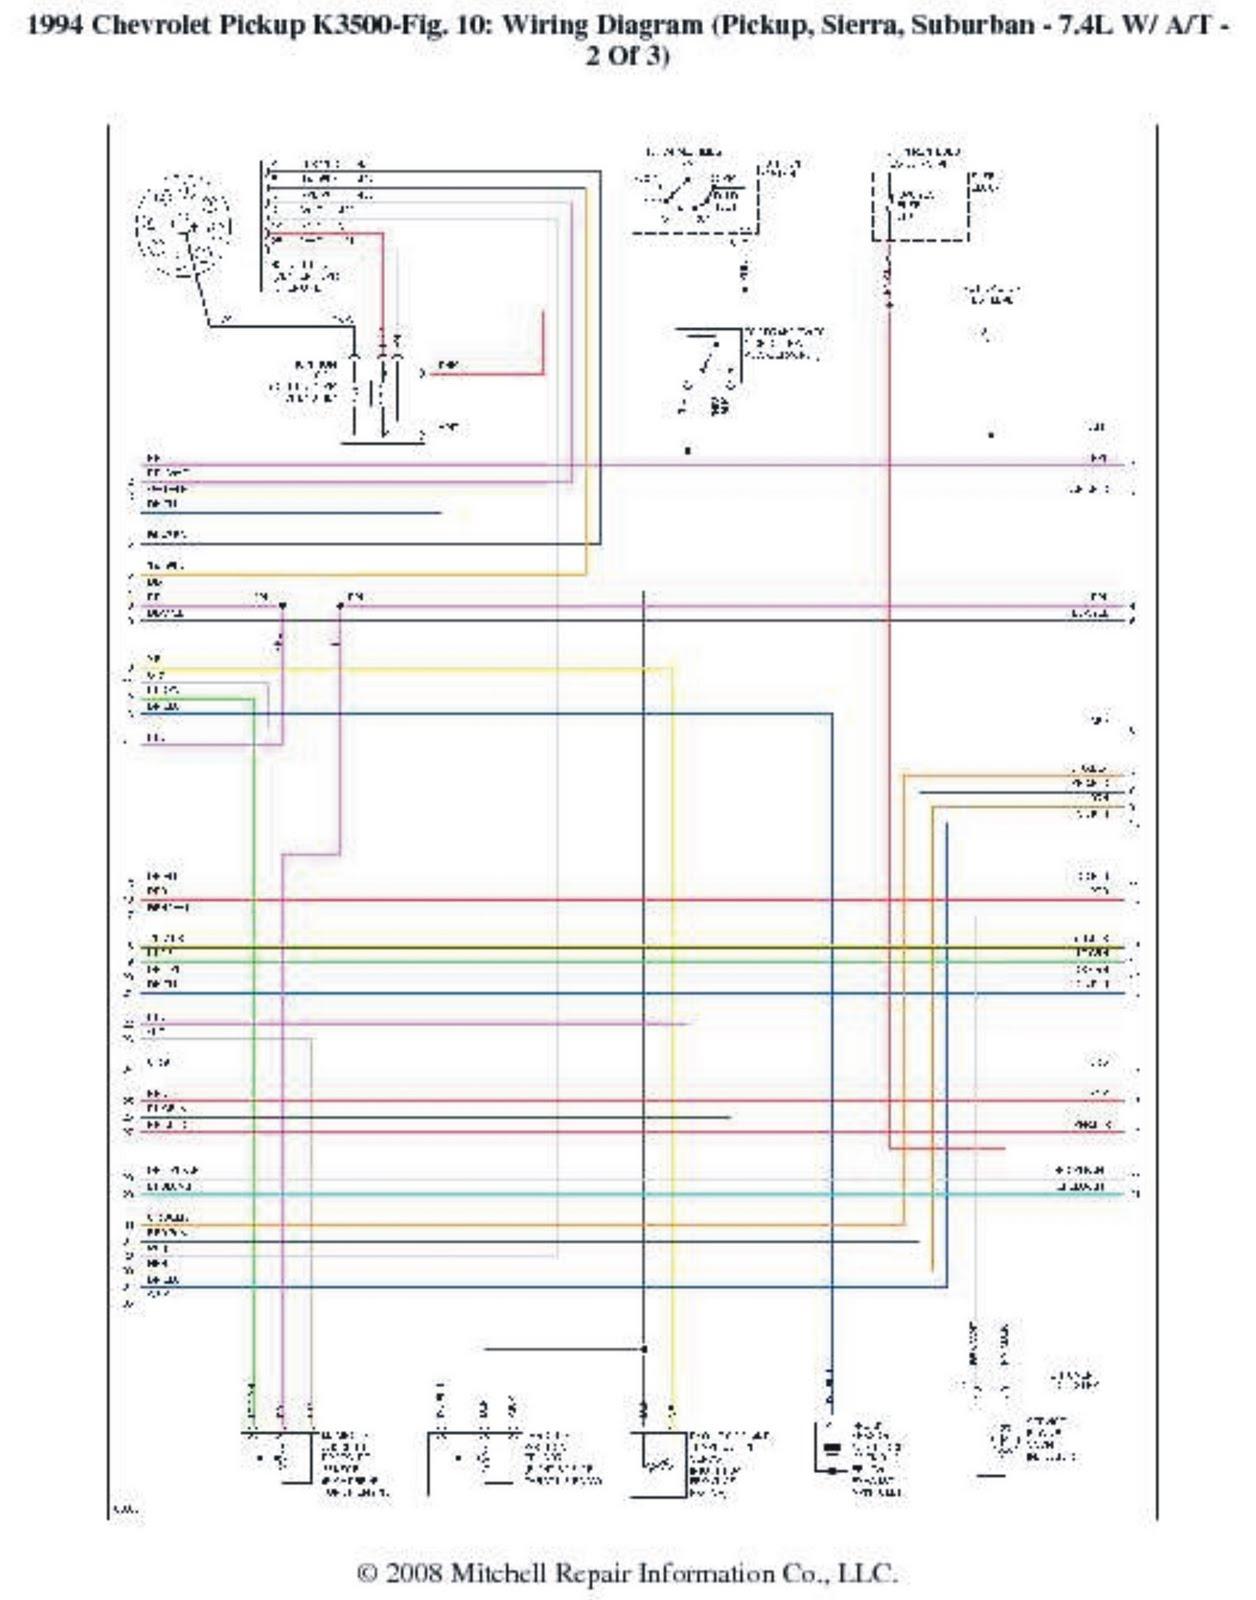 Mercury Remote Starter Diagram Wiring Libraries For Car Diagrams Suzuki Detailed Diagramsuzuki Library Nissan